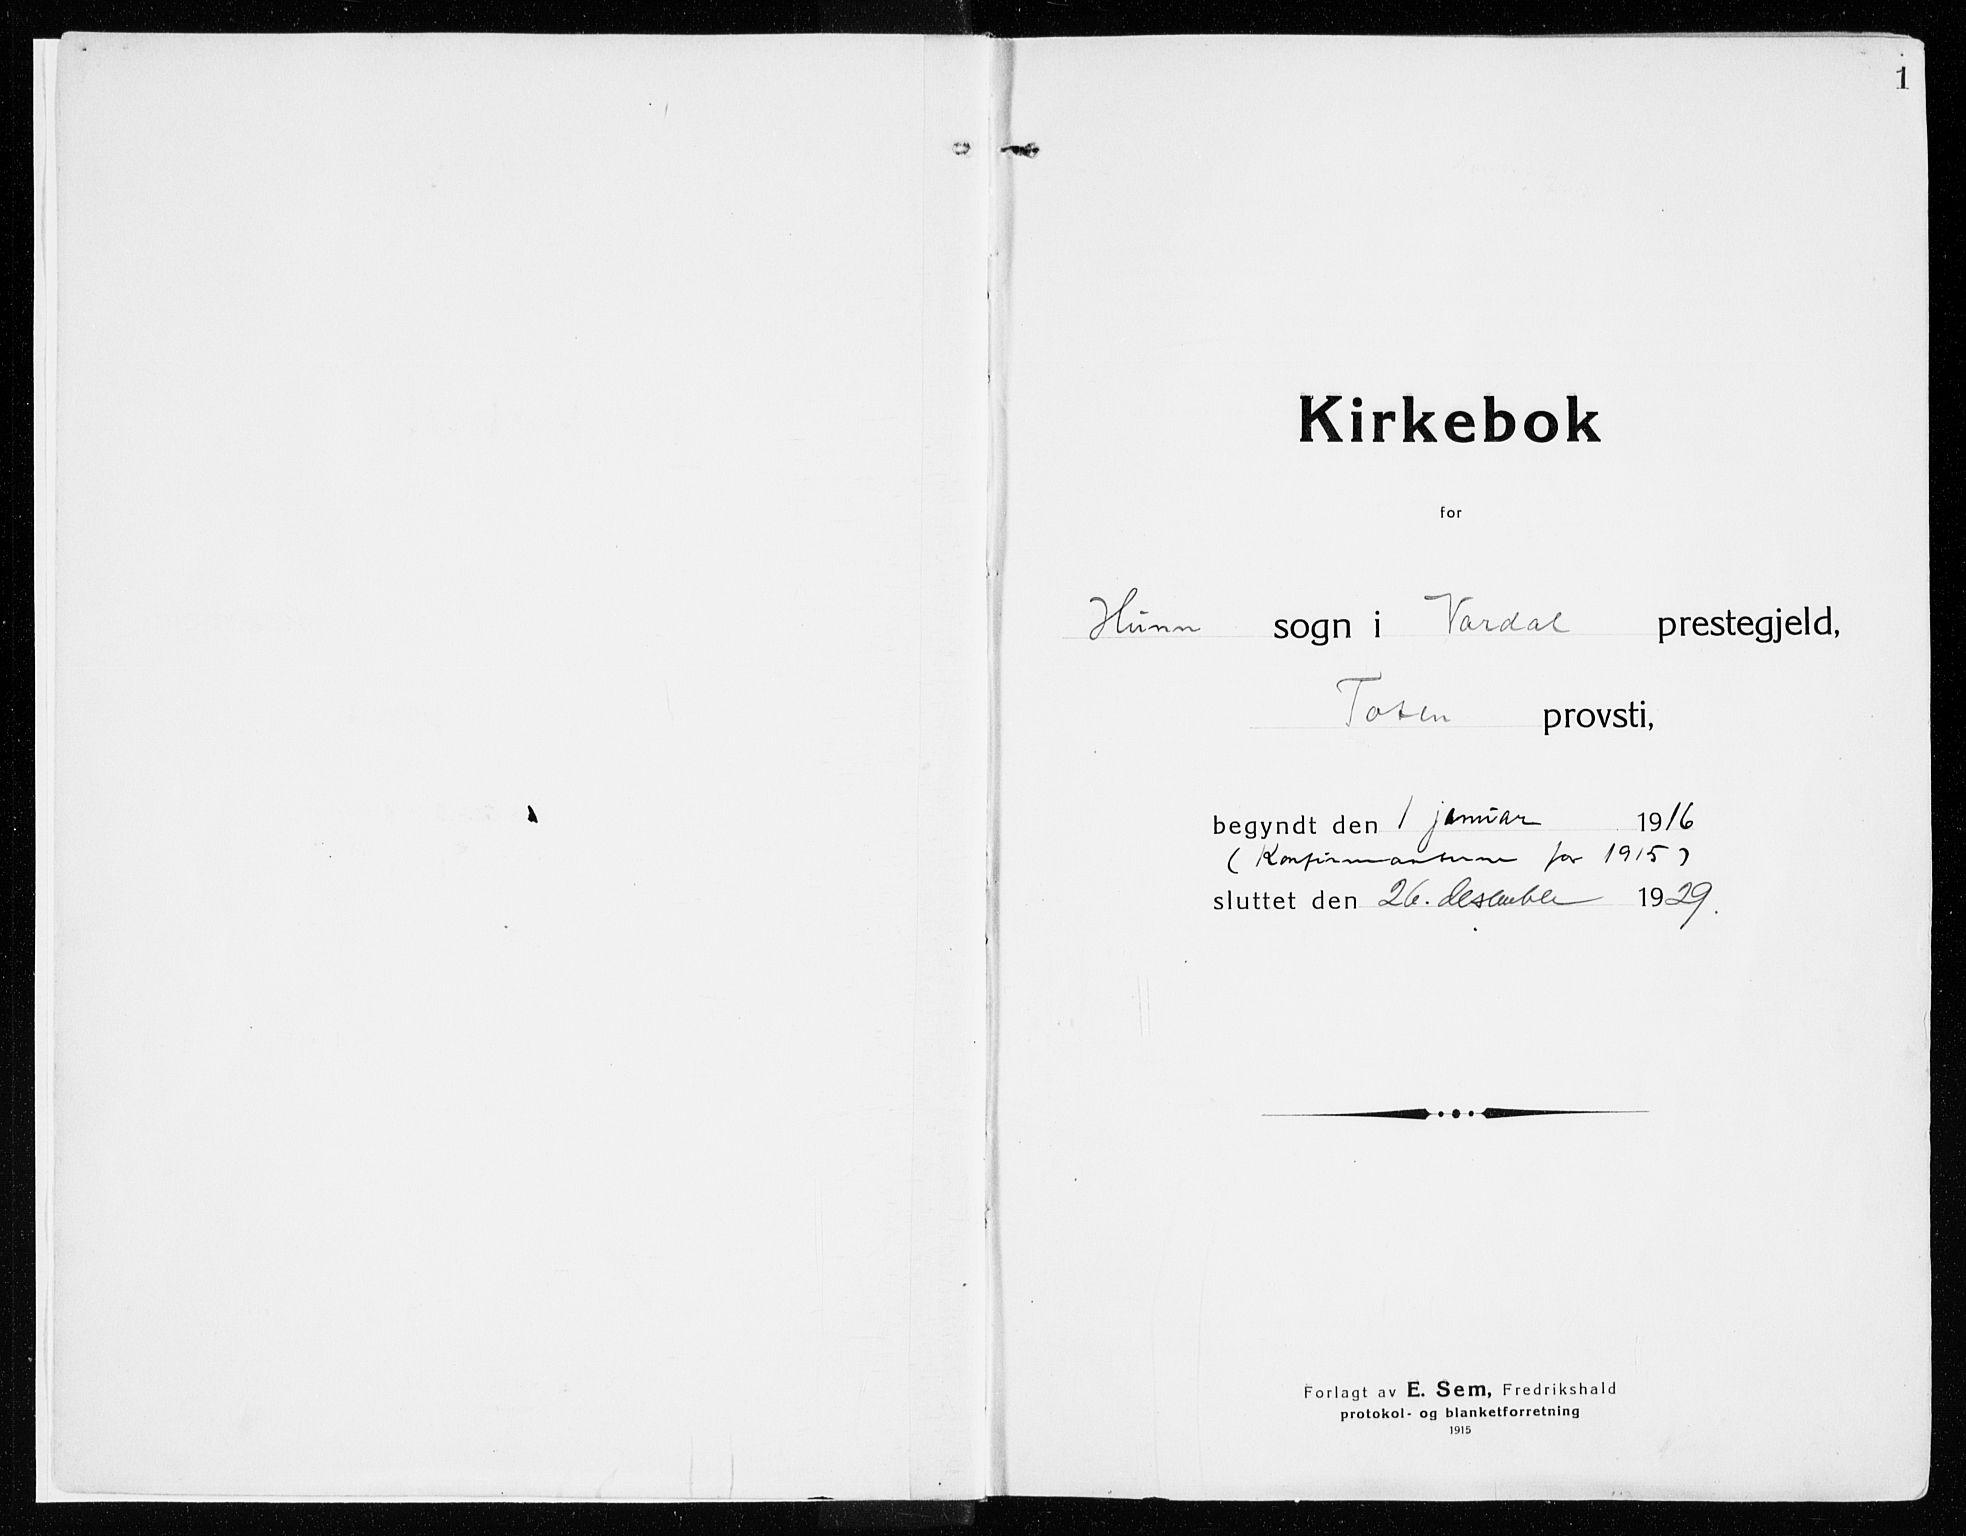 SAH, Vardal prestekontor, H/Ha/Haa/L0017: Ministerialbok nr. 17, 1915-1929, s. 1